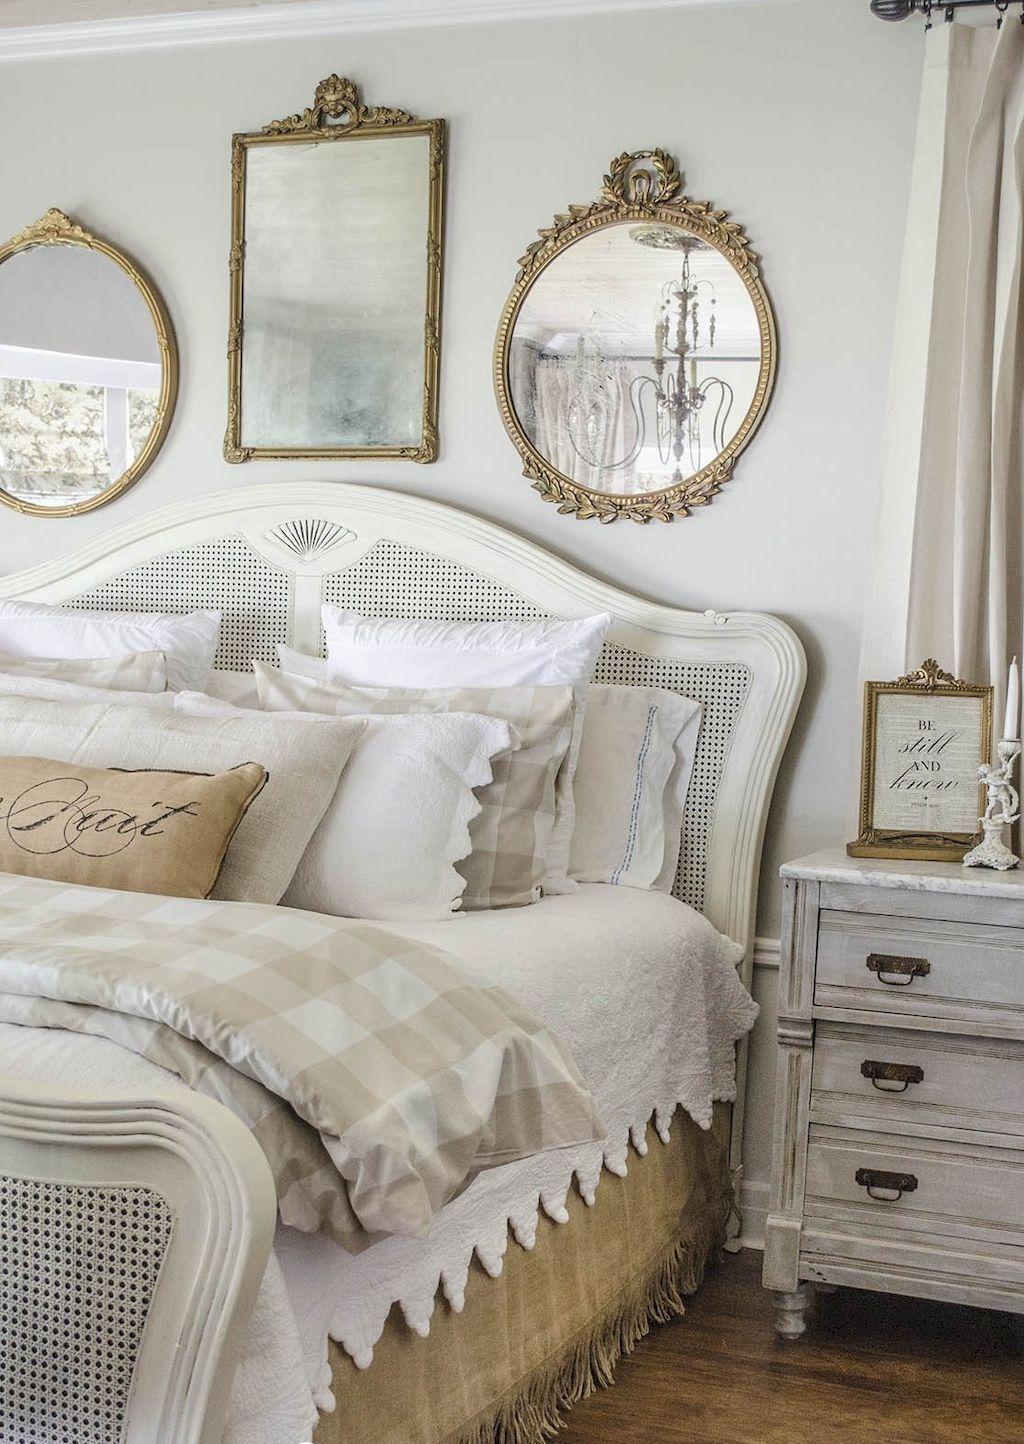 Romantic Shabby Chic Bedroom Decorating Ideas (53)